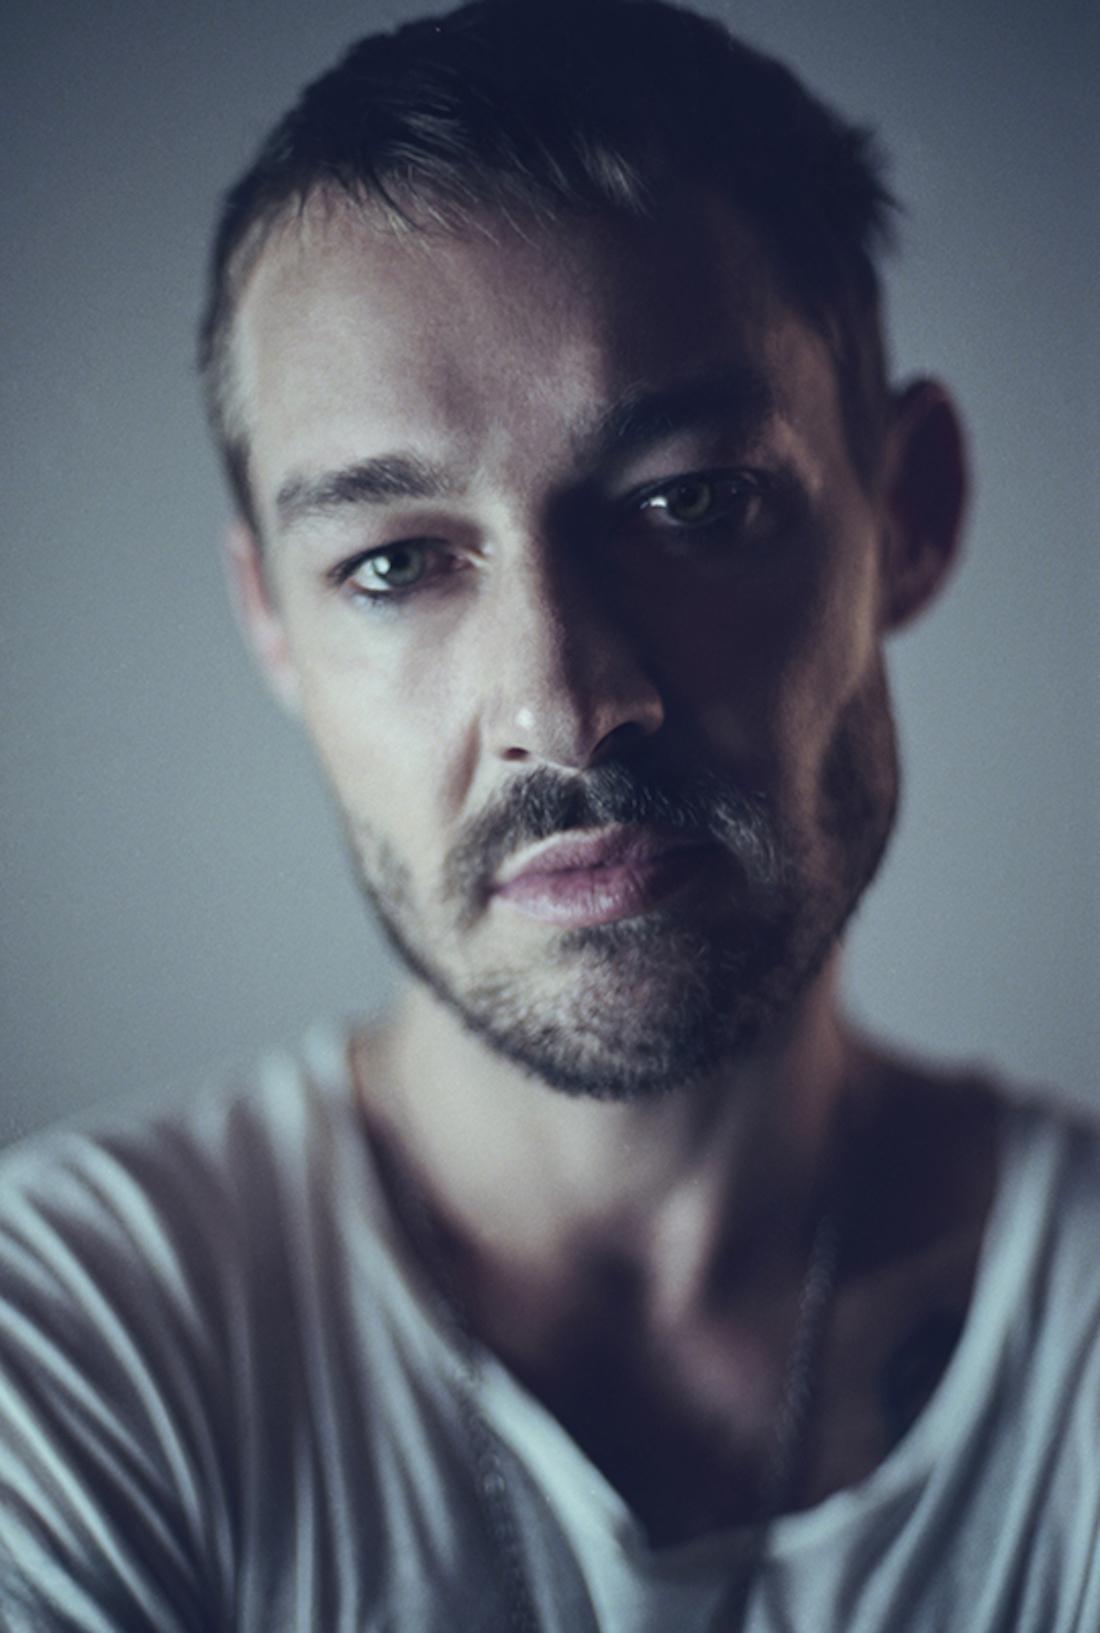 daniel johns - photo #19